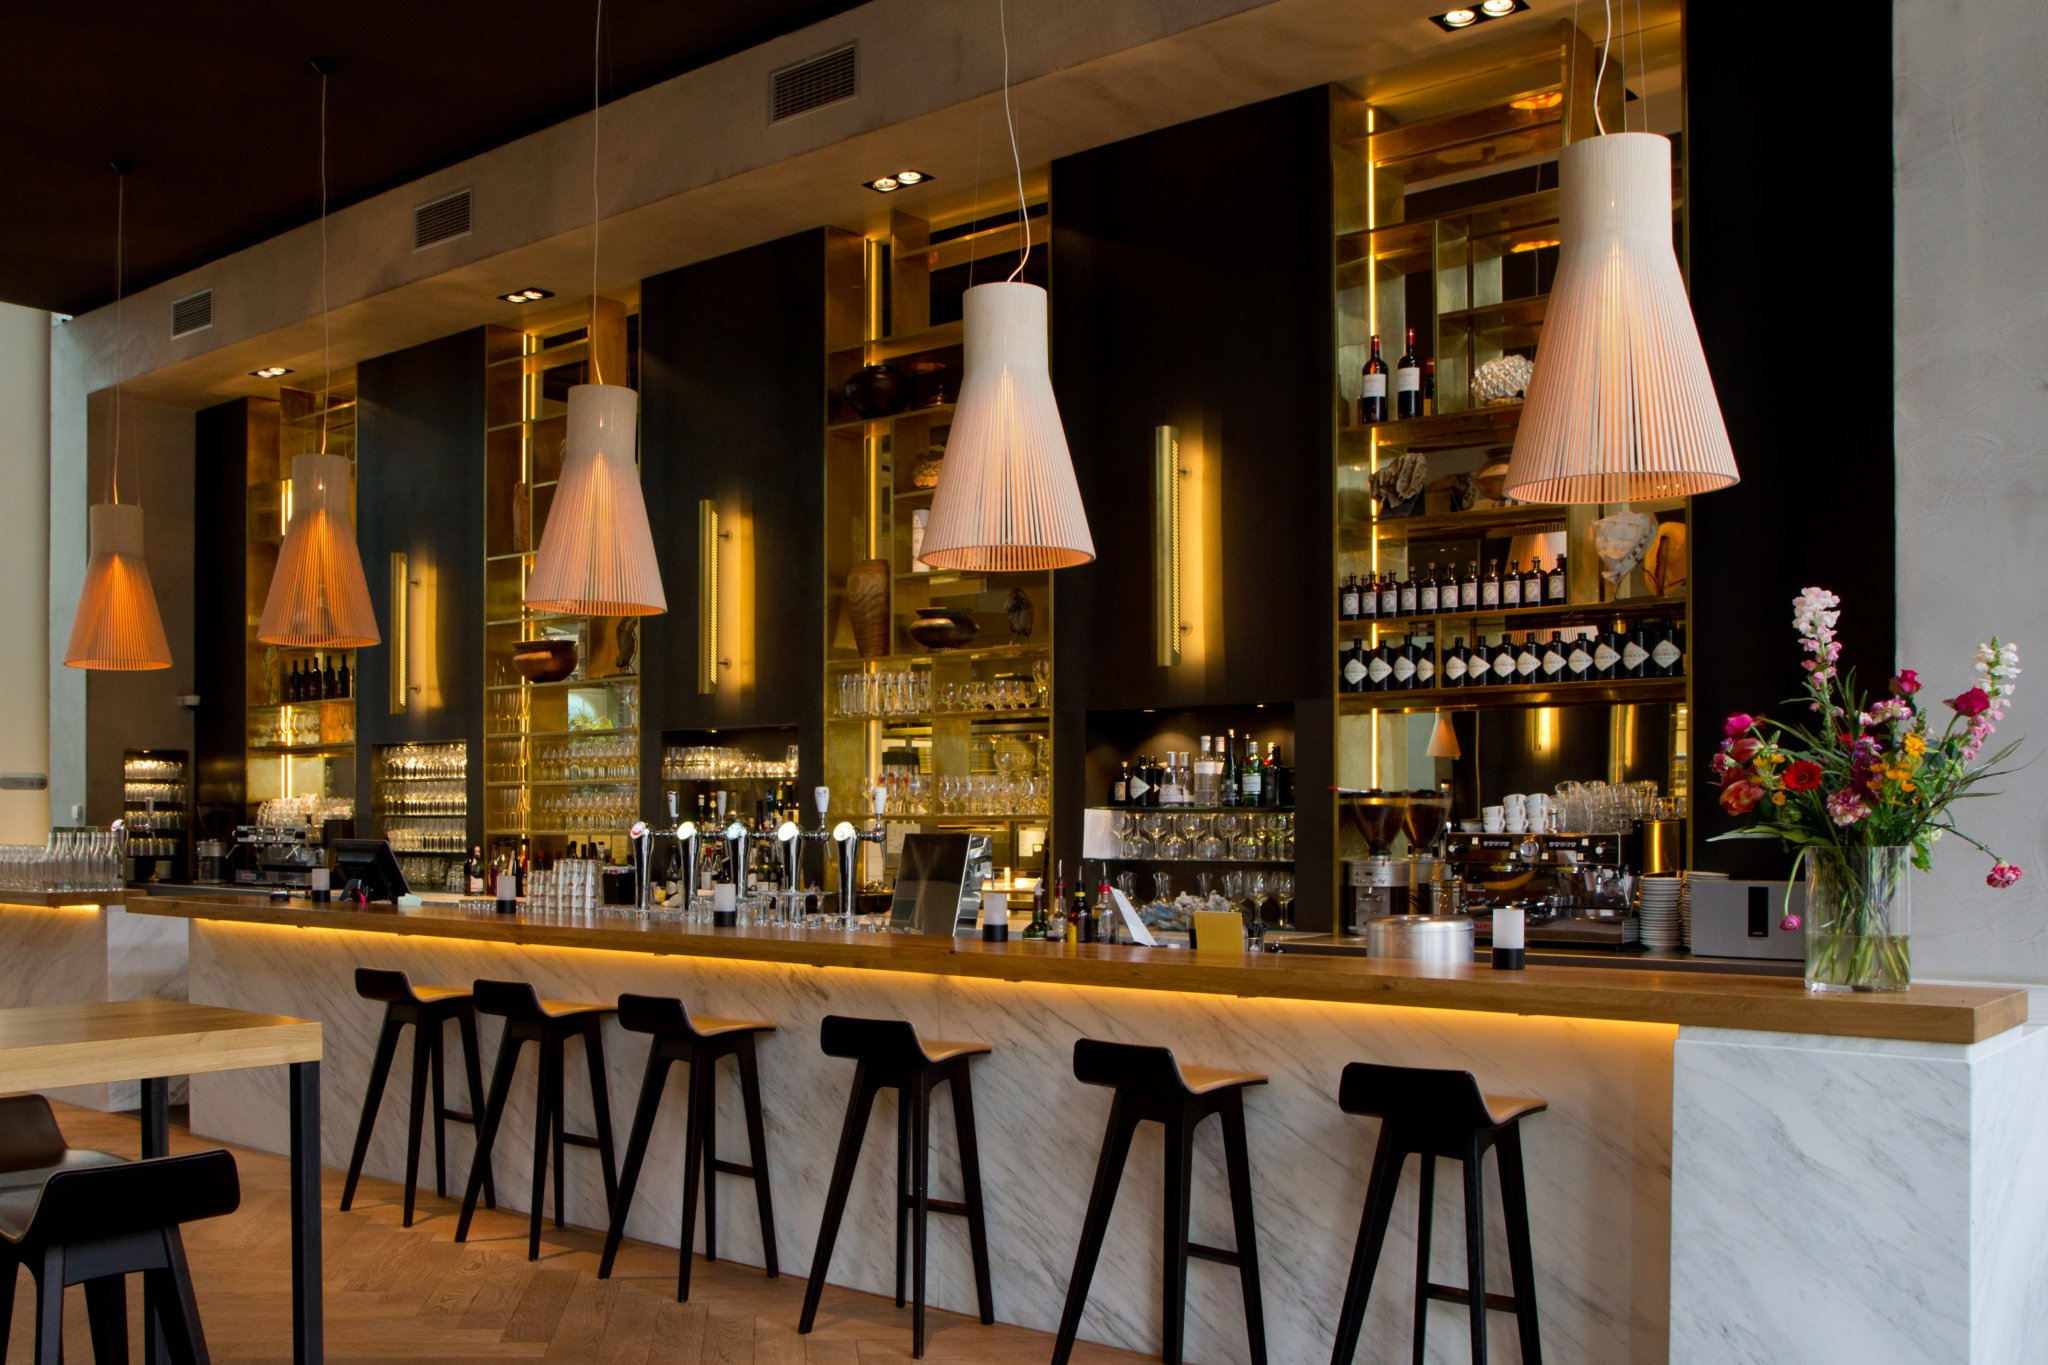 Spiksplinternieuw Café-restaurant de Plantage | TunnelmaDesign KV-42